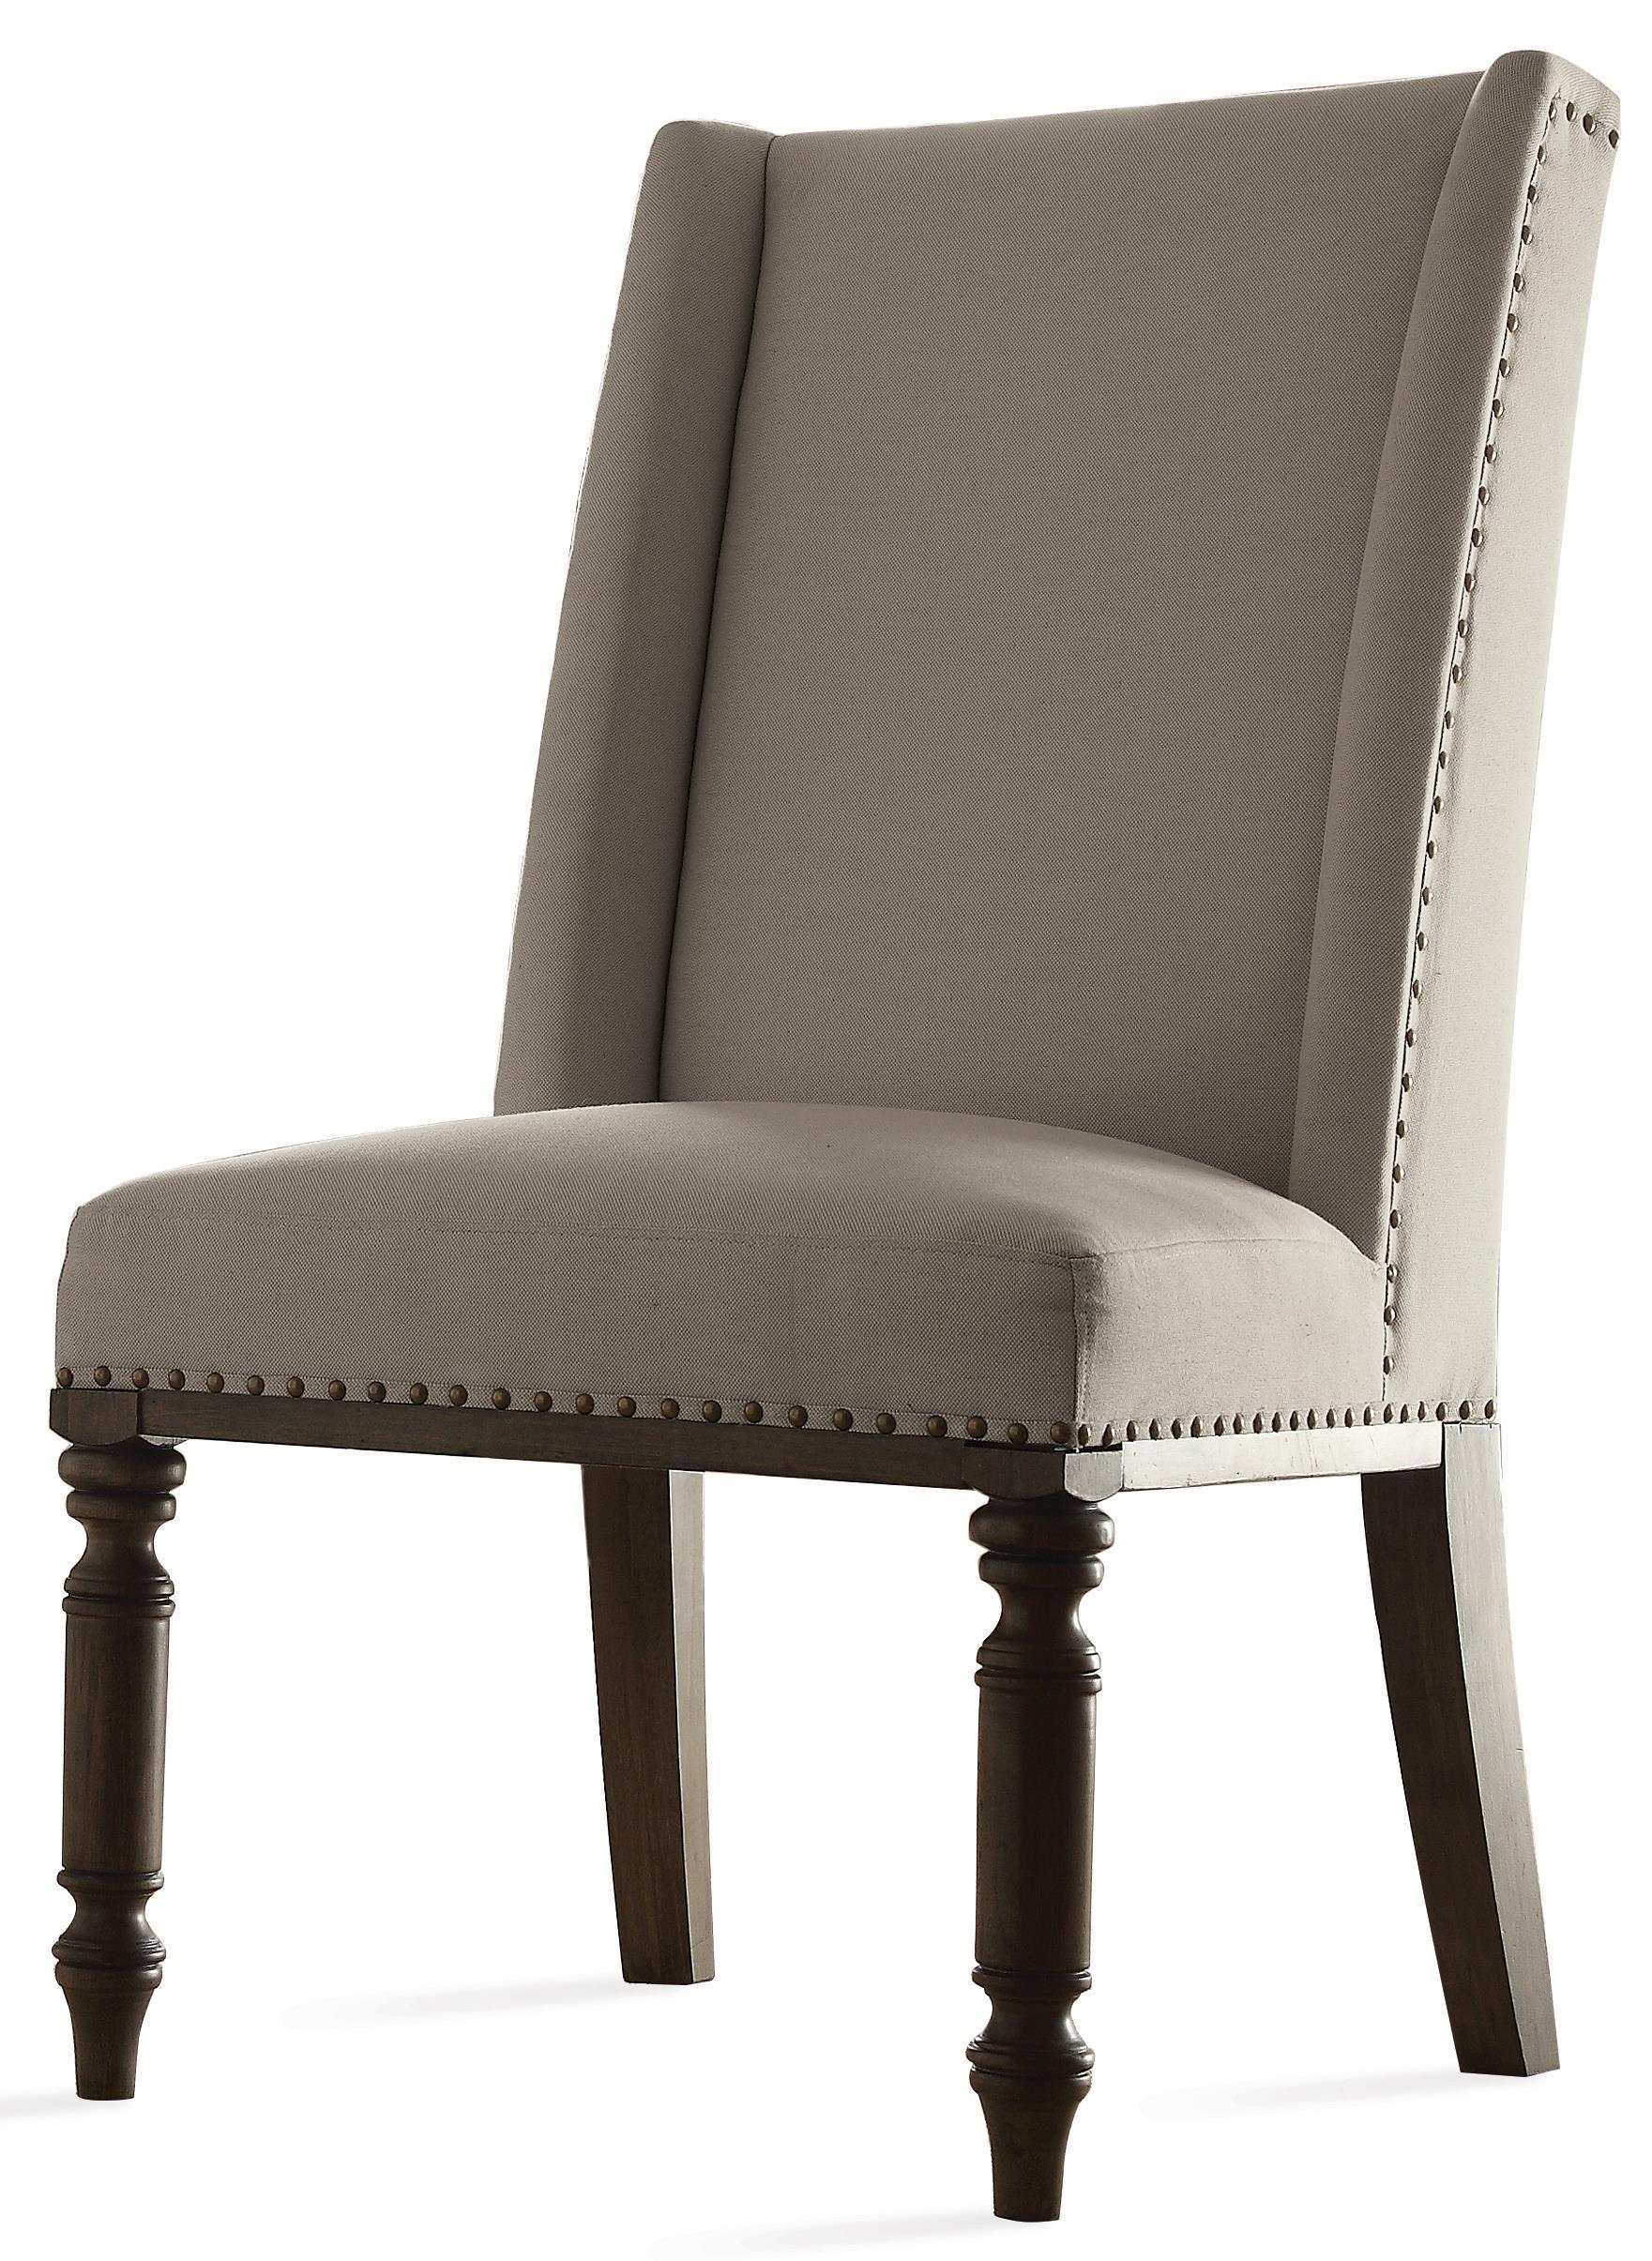 High Quality Riverside Furniture Belmeade Hostess Chair W/ Nailhead Trim   Hudsonu0027s  Furniture   Dining Side Chairs